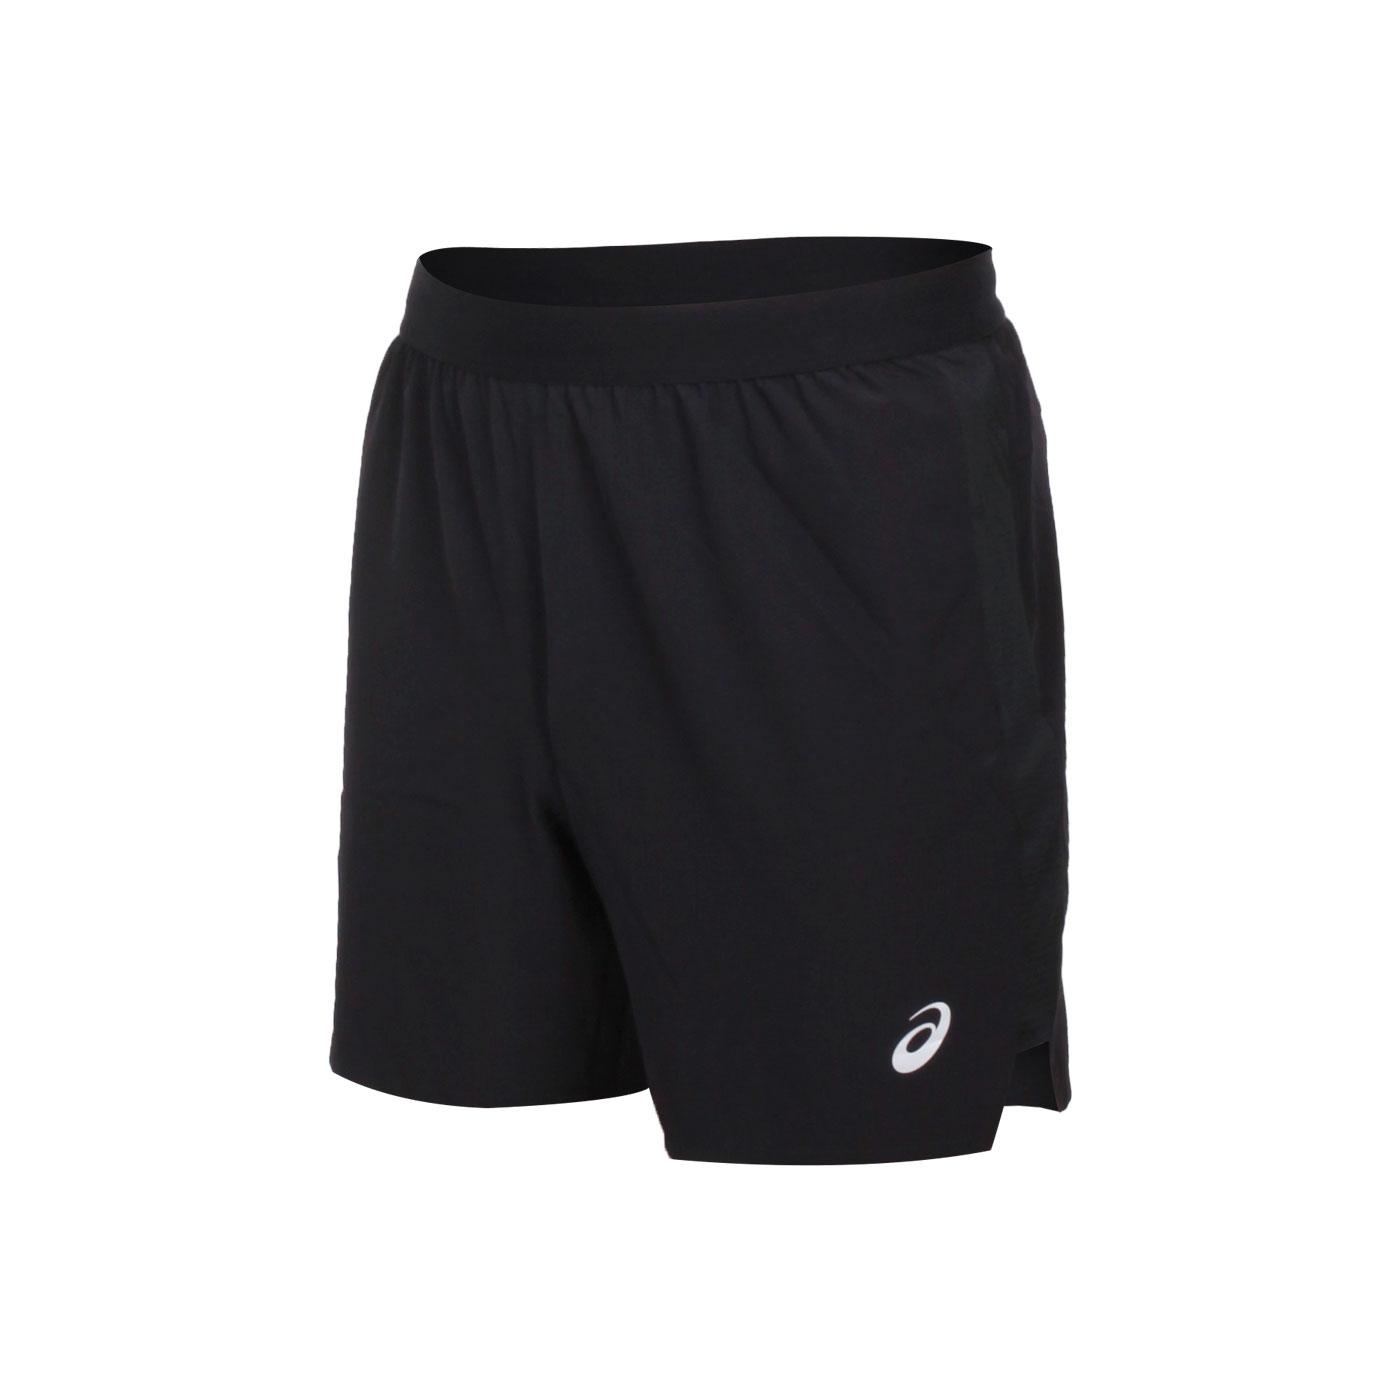 ASICS 男款七吋平織短褲 2011A768-001 - 黑銀